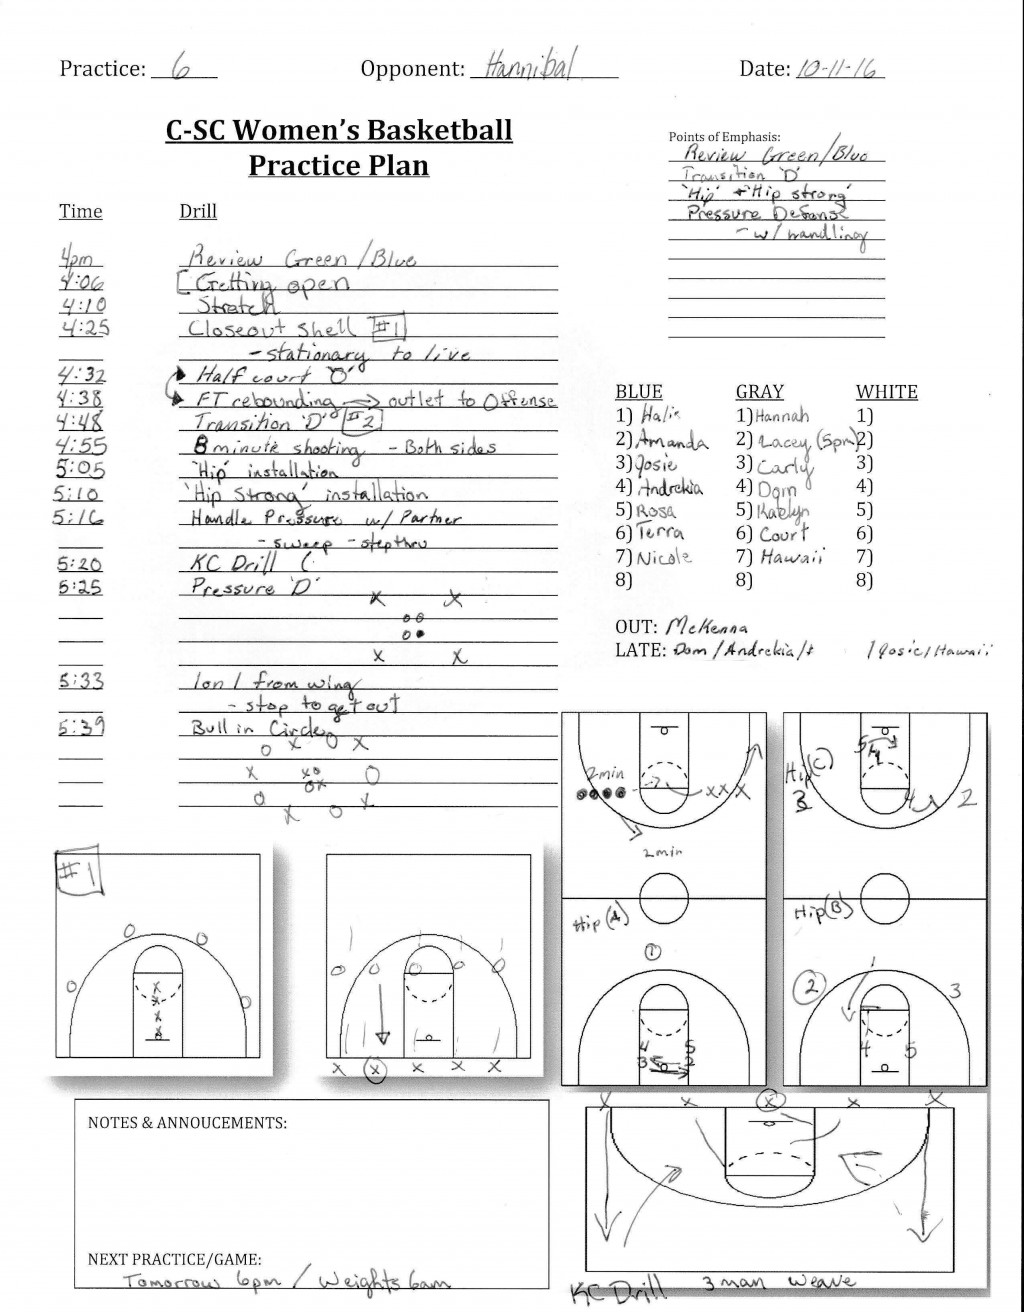 005 Beautiful Basketball Practice Plan Template Image  Pdf Fillable Google DocLarge